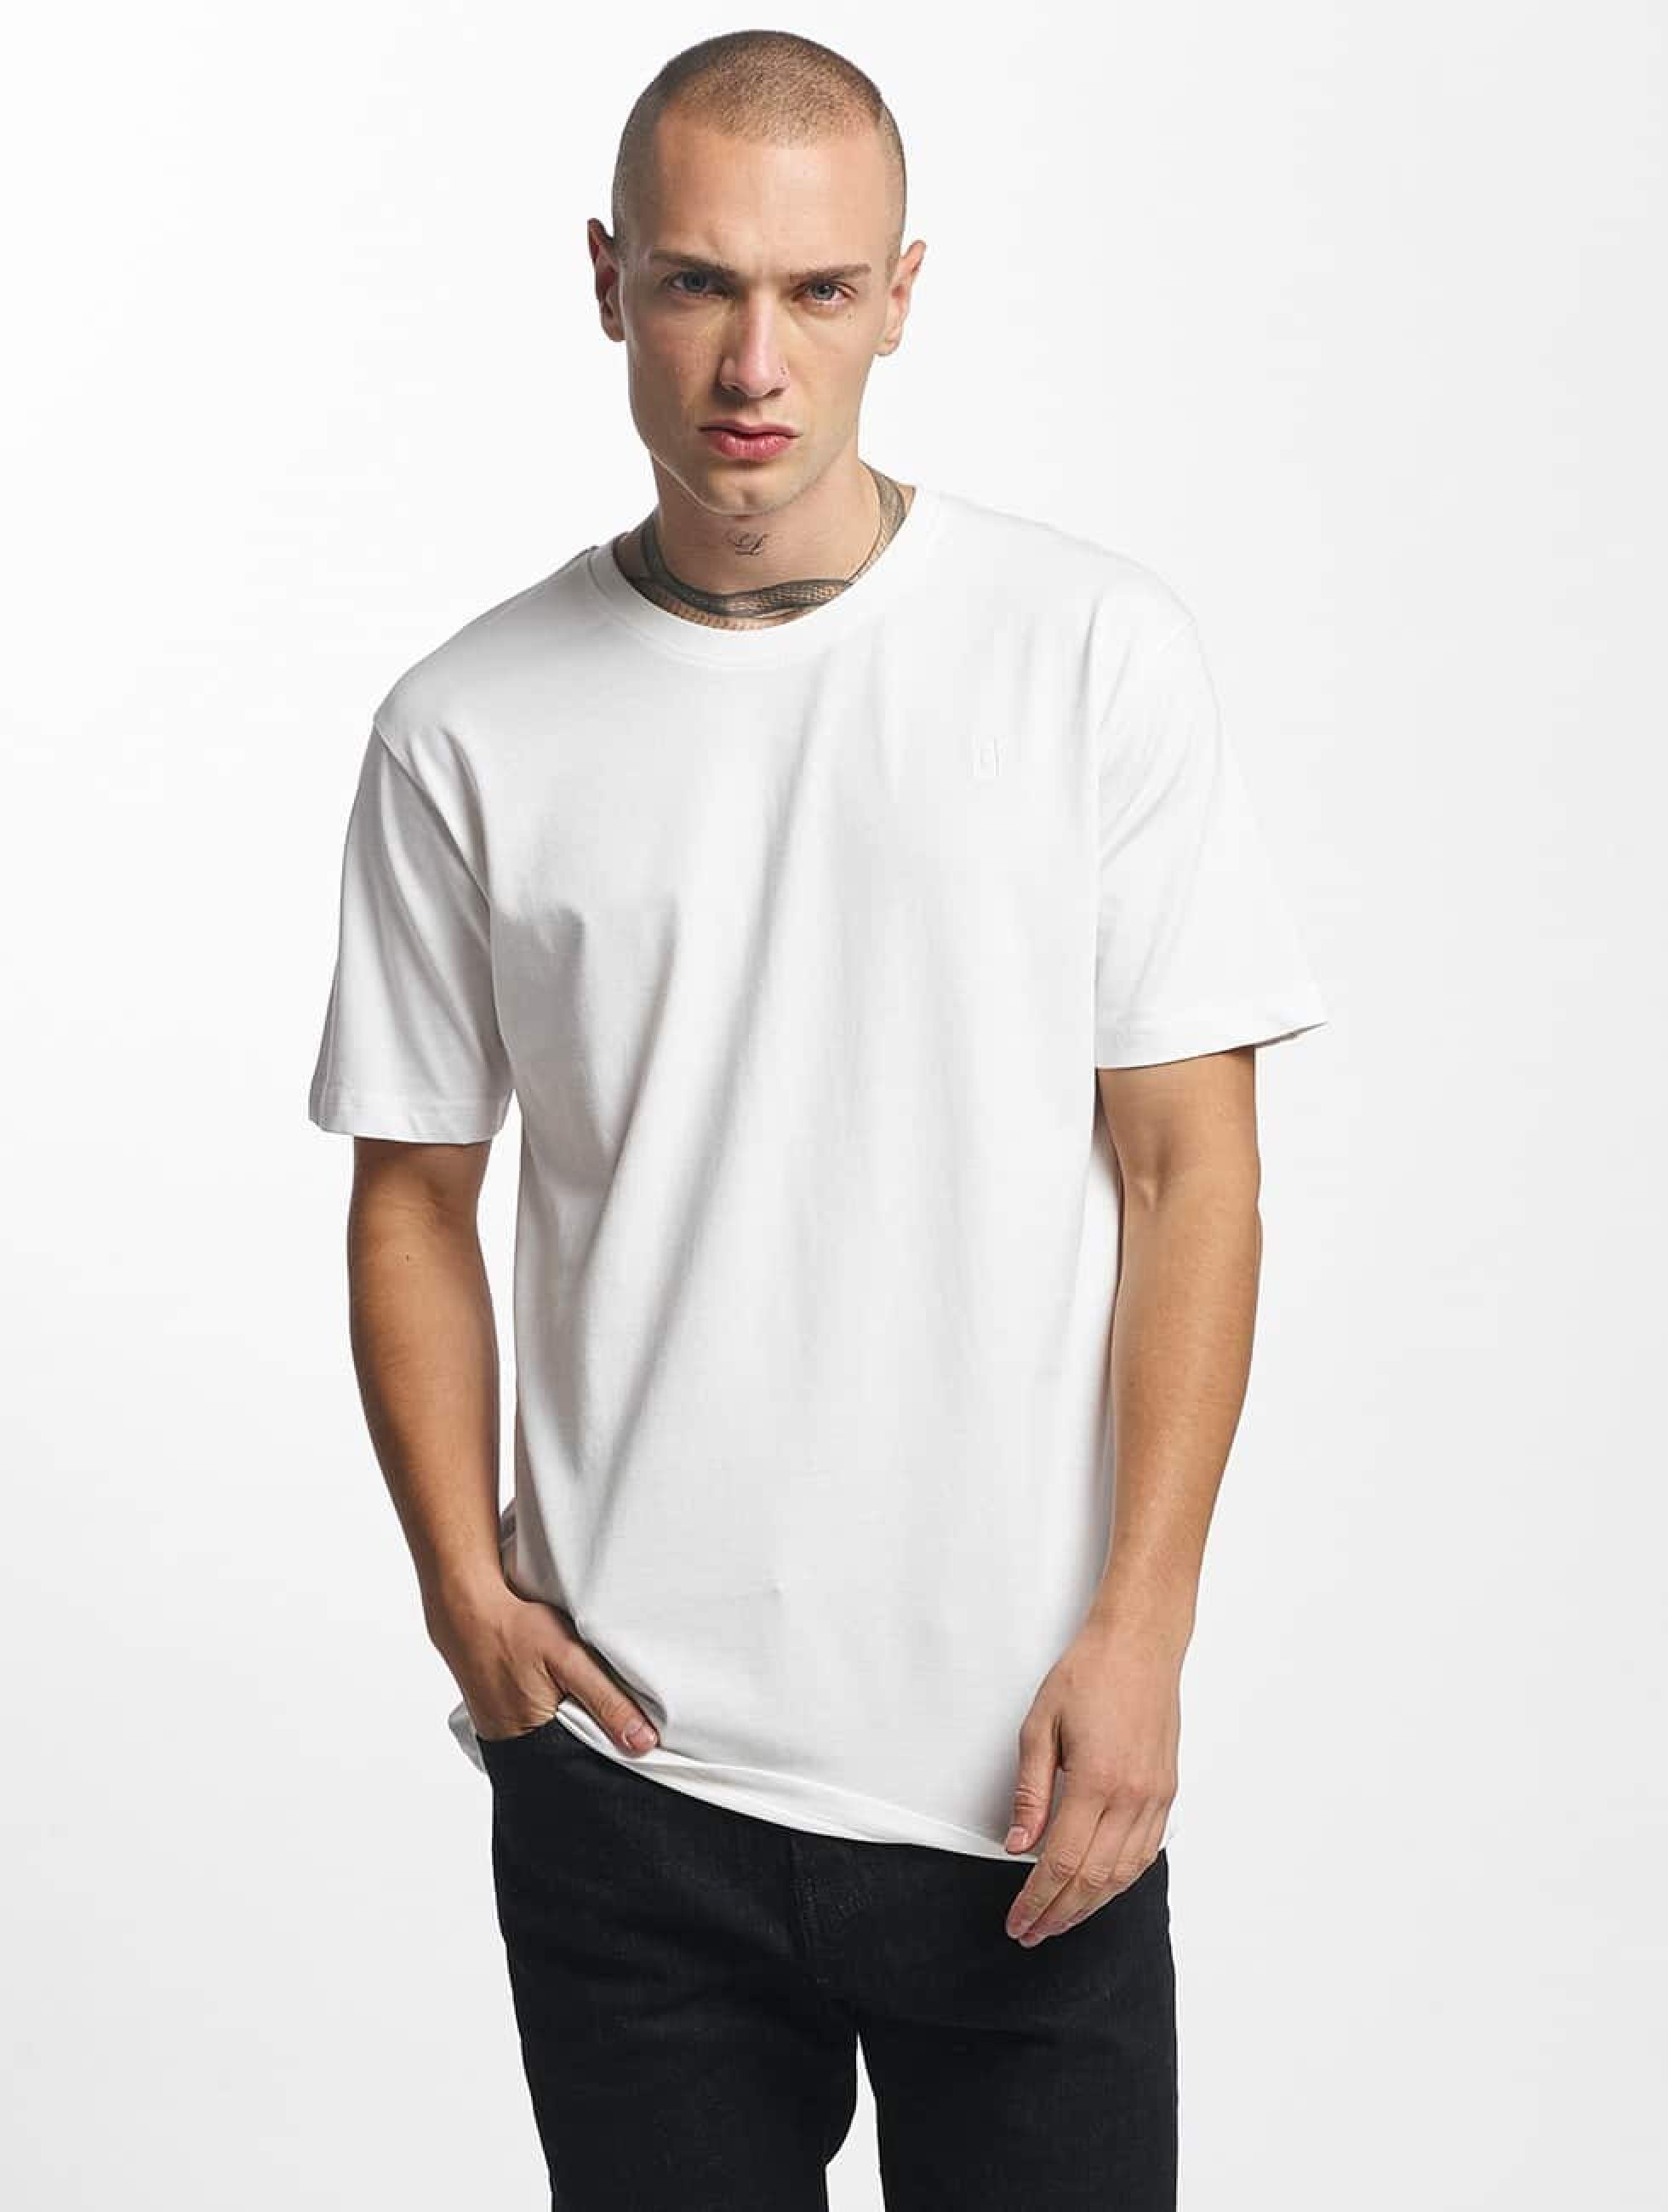 Cyprime / T-Shirt Titanium in white S